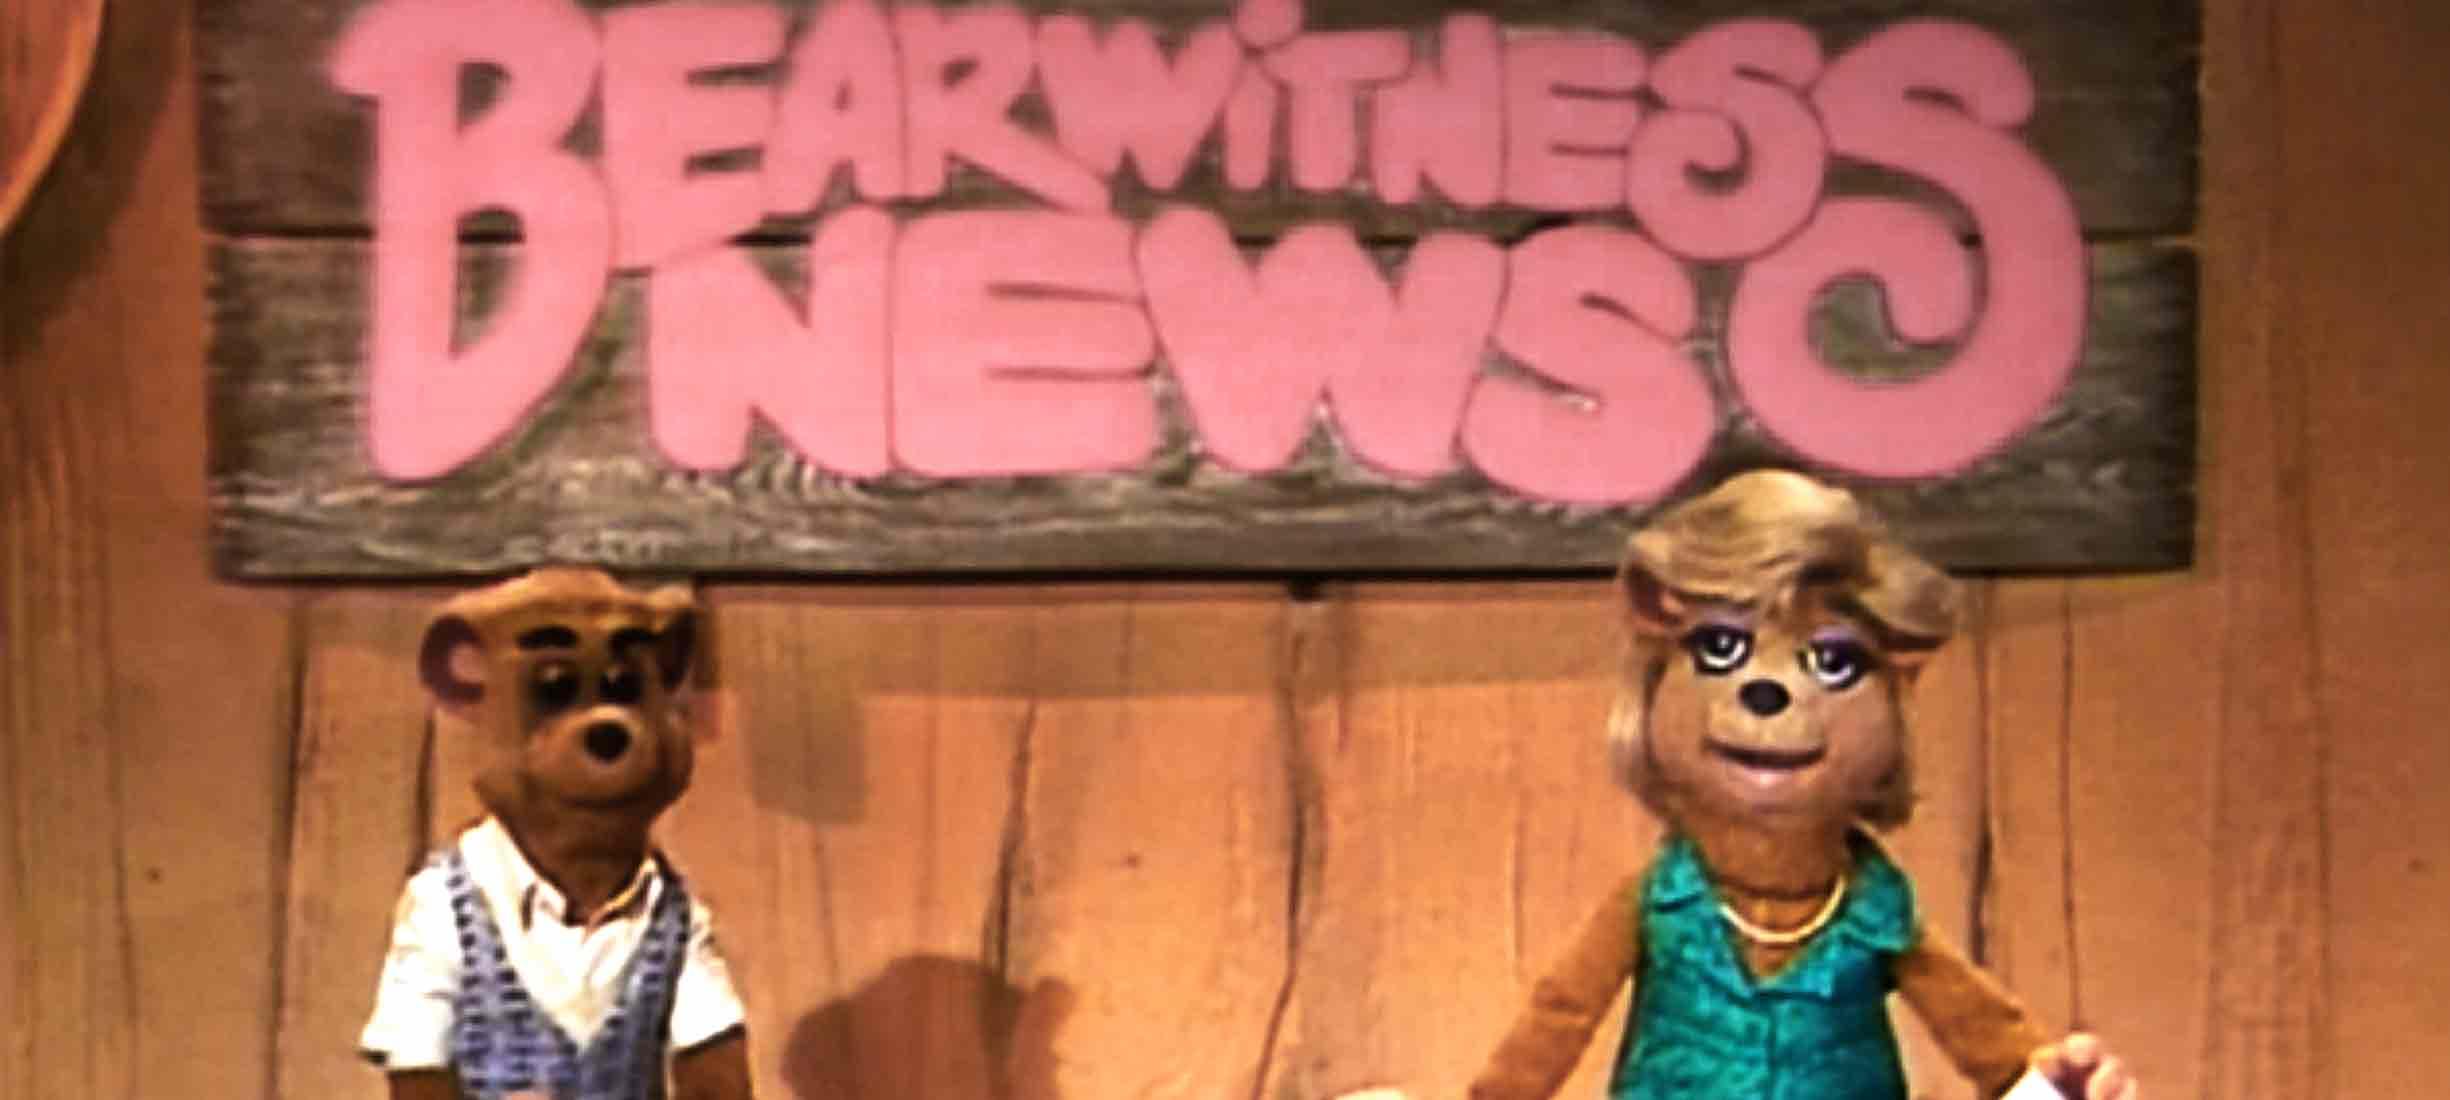 Ted E. Bear: Cub Reporter